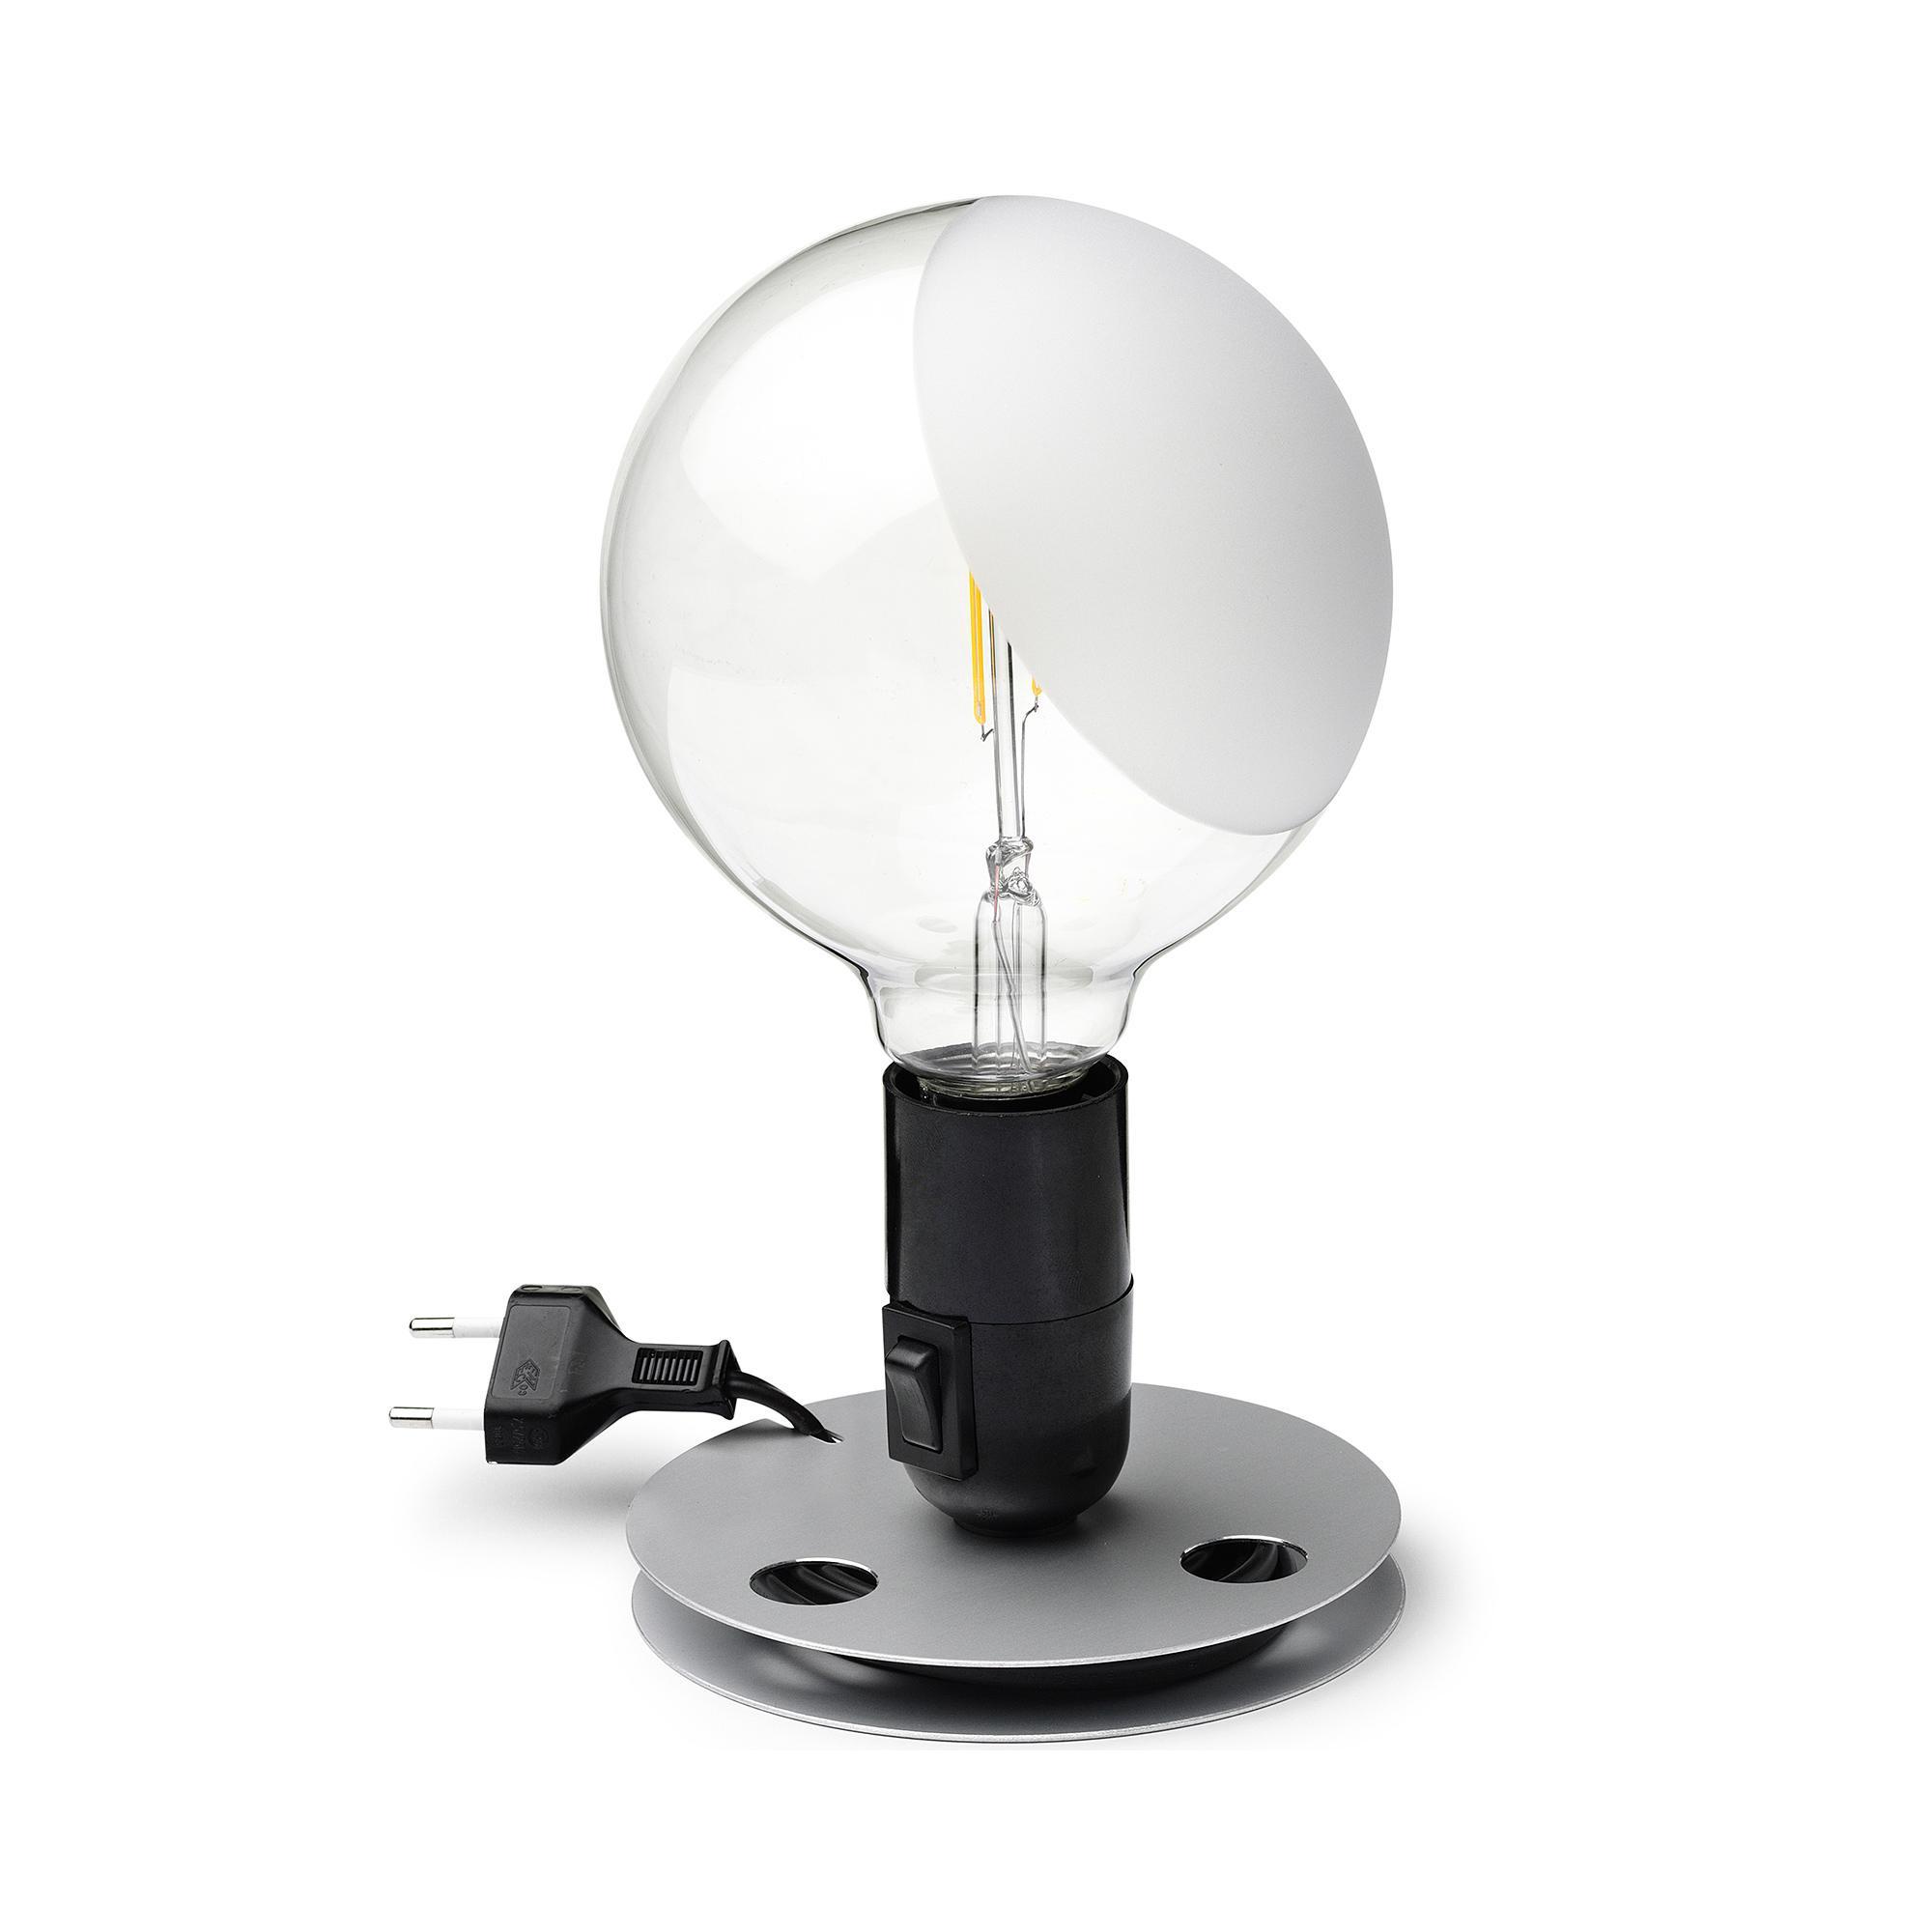 Flos - Lampadina - schwarz/Aluminium | Schlafzimmer > Nachttische | Schwarz | Aluminium | Flos